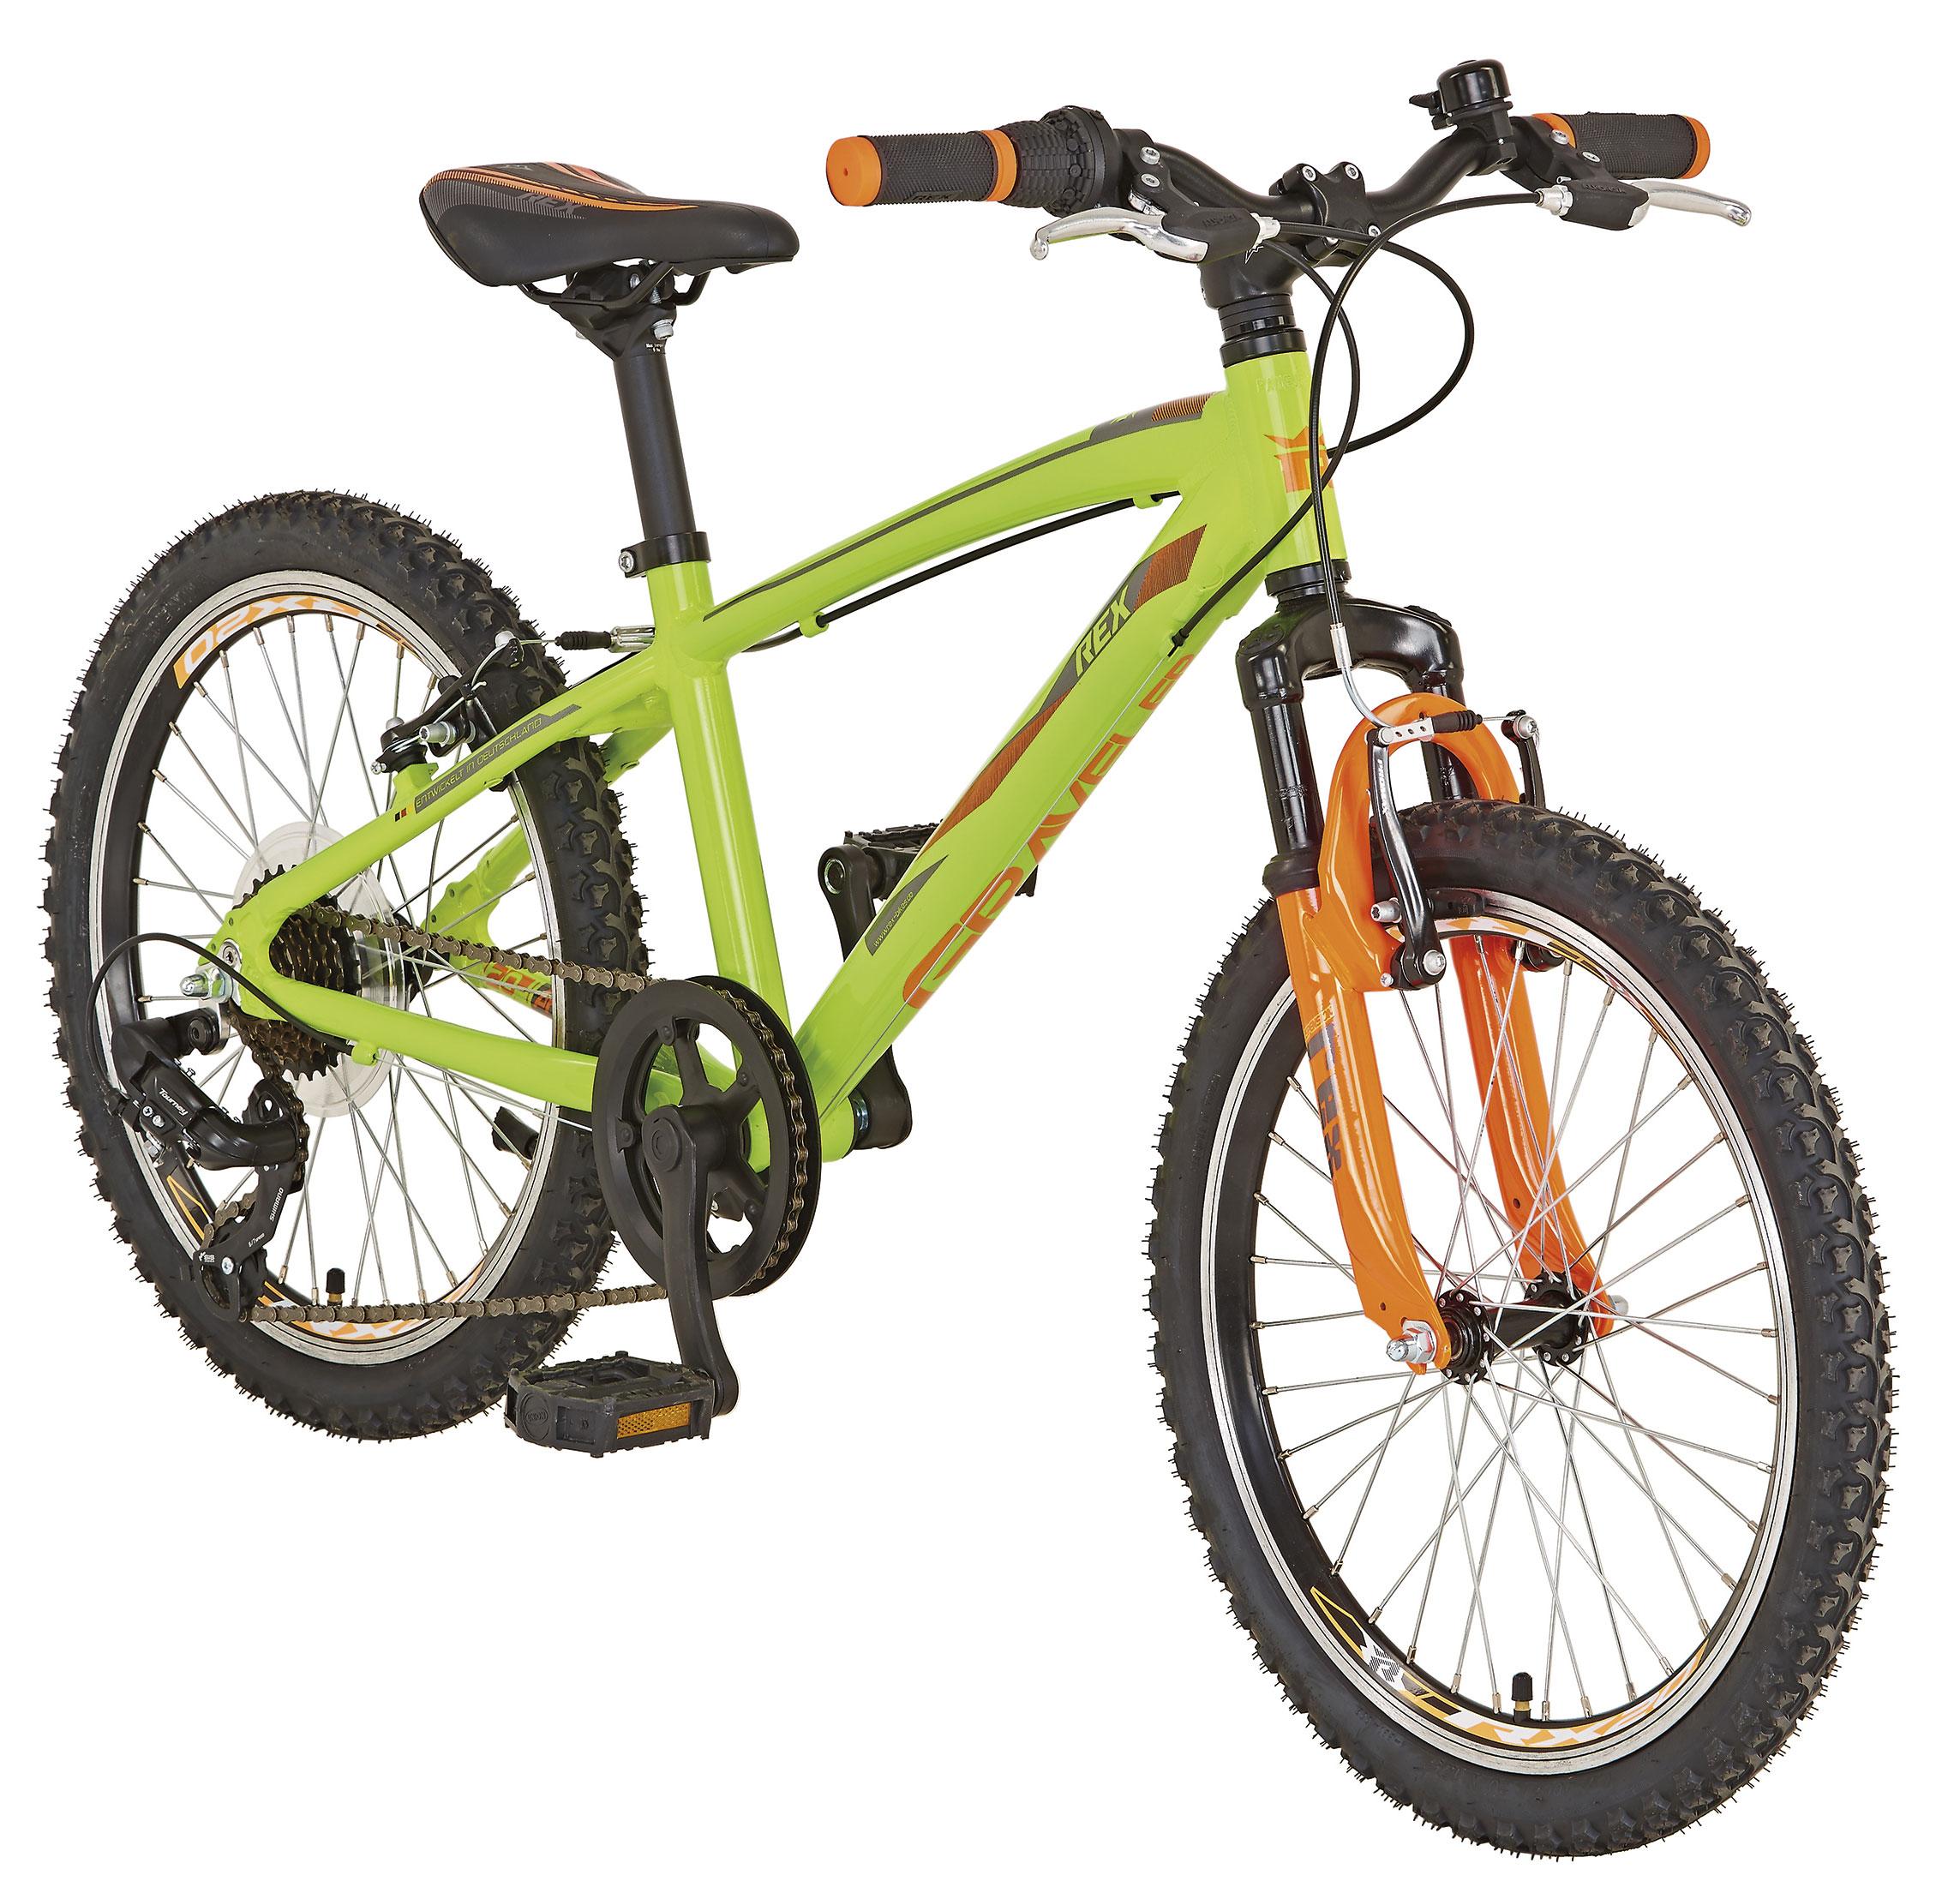 kinderfahrrad mountainbike jungen mtb kid 20 rexbike. Black Bedroom Furniture Sets. Home Design Ideas